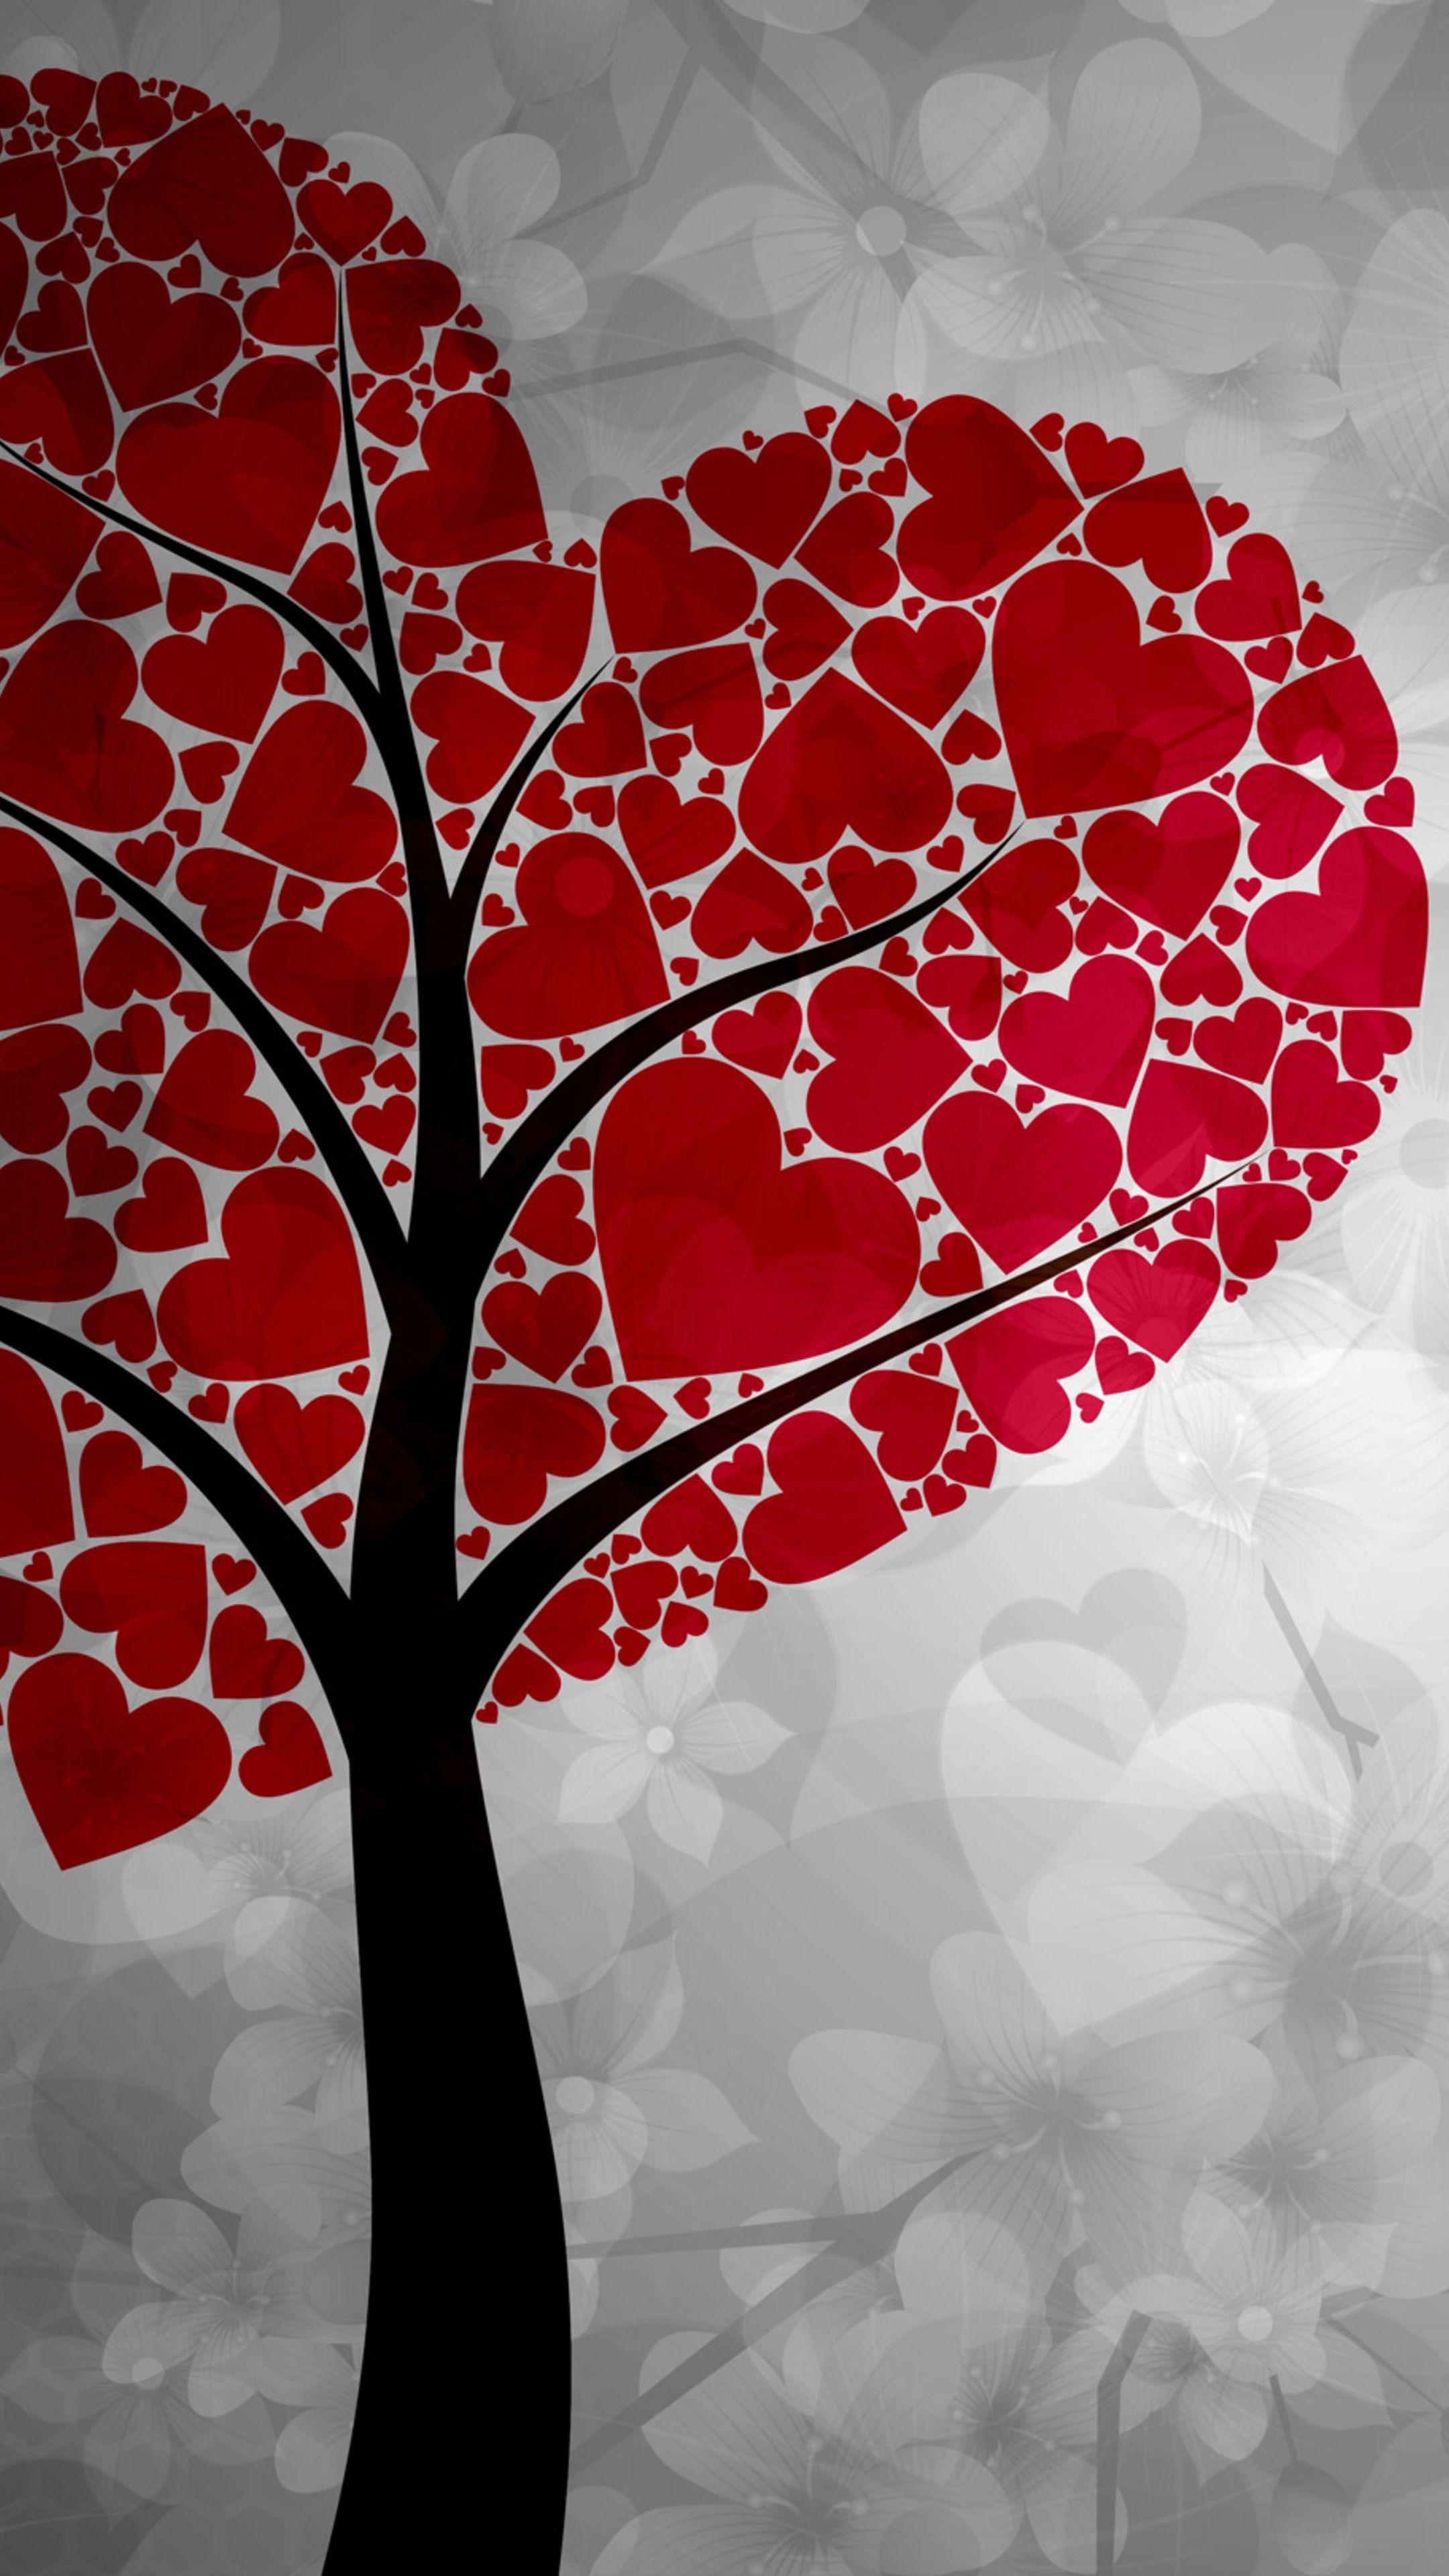 Emotions Artistic Heart Tree wallpapers hd 4k